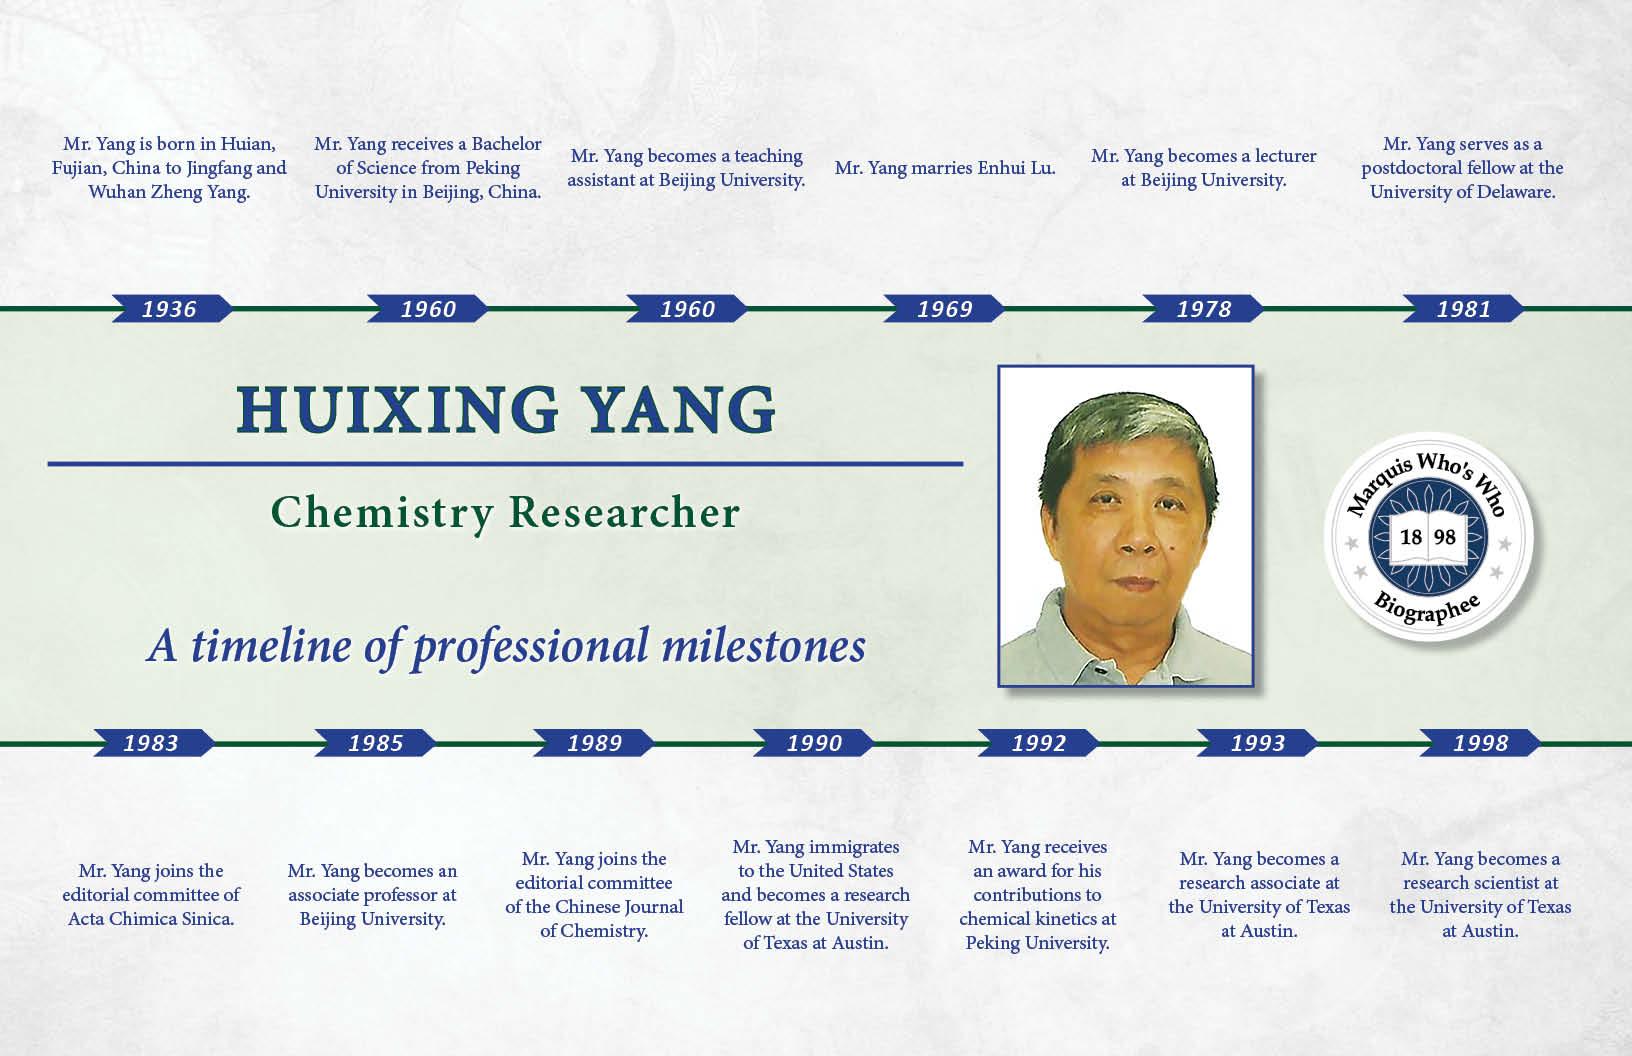 Huixing Yang Professional Milestones